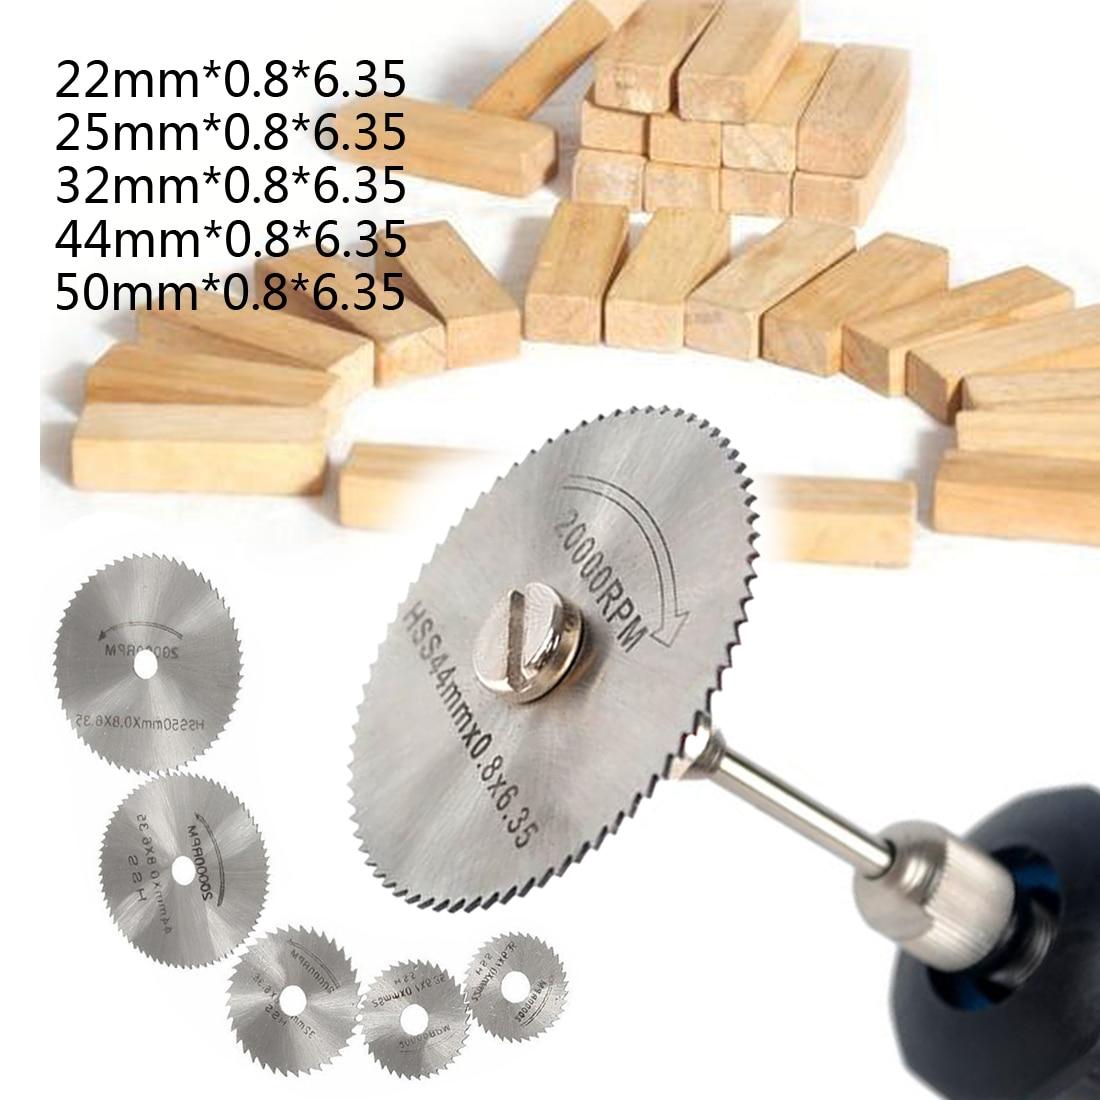 Hss High-speed-steel Circular Rotary Circular Saw Blades Mandrel For Tools Wood Cutting Saw Blades